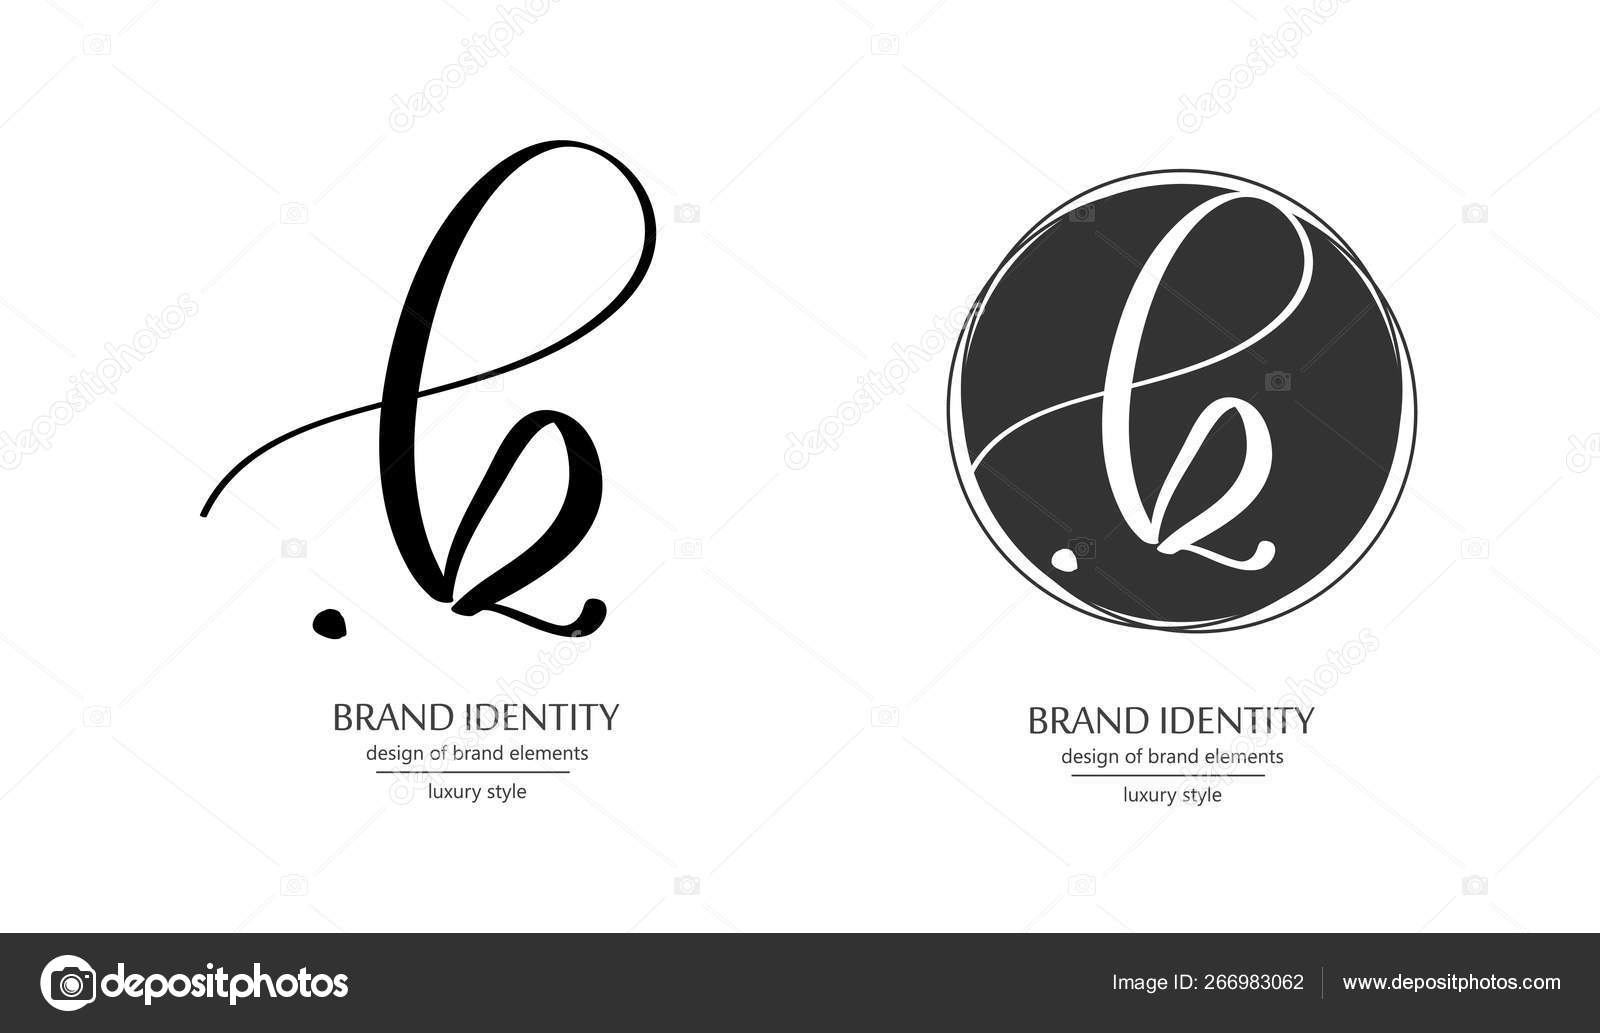 Creative Hand Drawn Monogram Calligraphy Brand Identity Logo